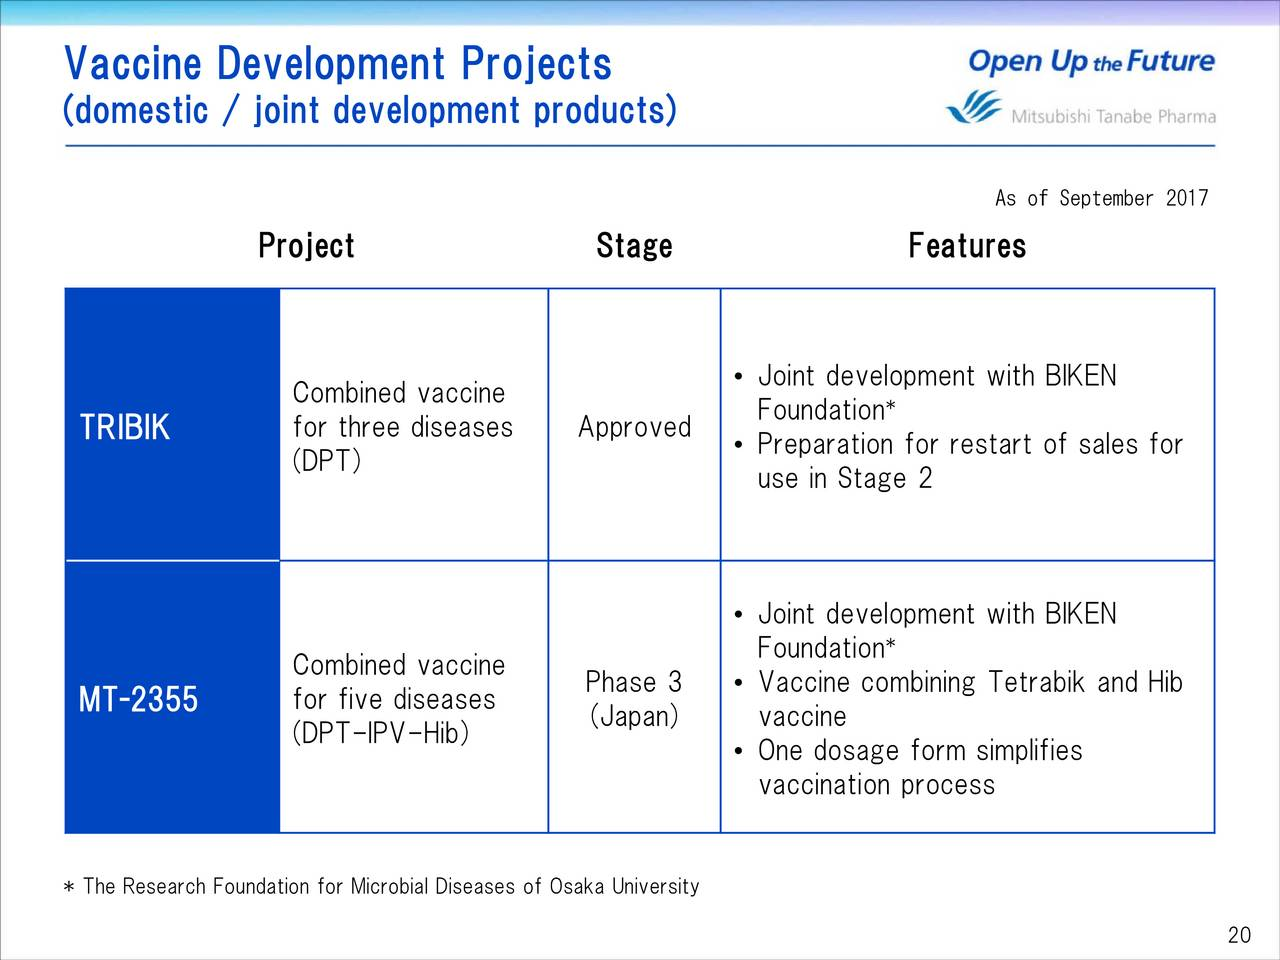 Mitsubishi Tanabe Pharma (MTZPY) Investor Presentation